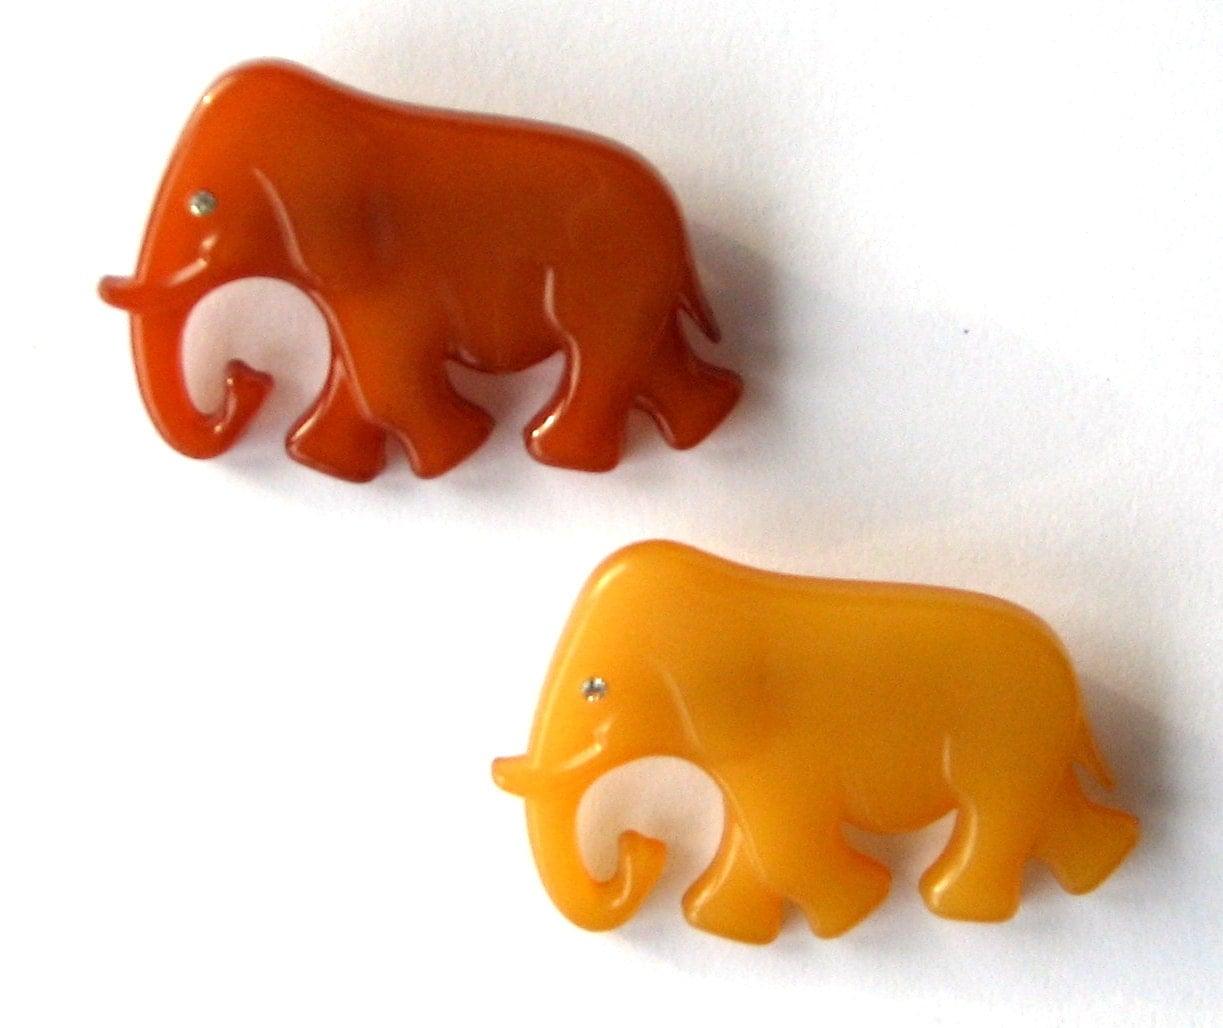 Baby Elephants Pin Back Brooch Beige Brown - VeraReyniers